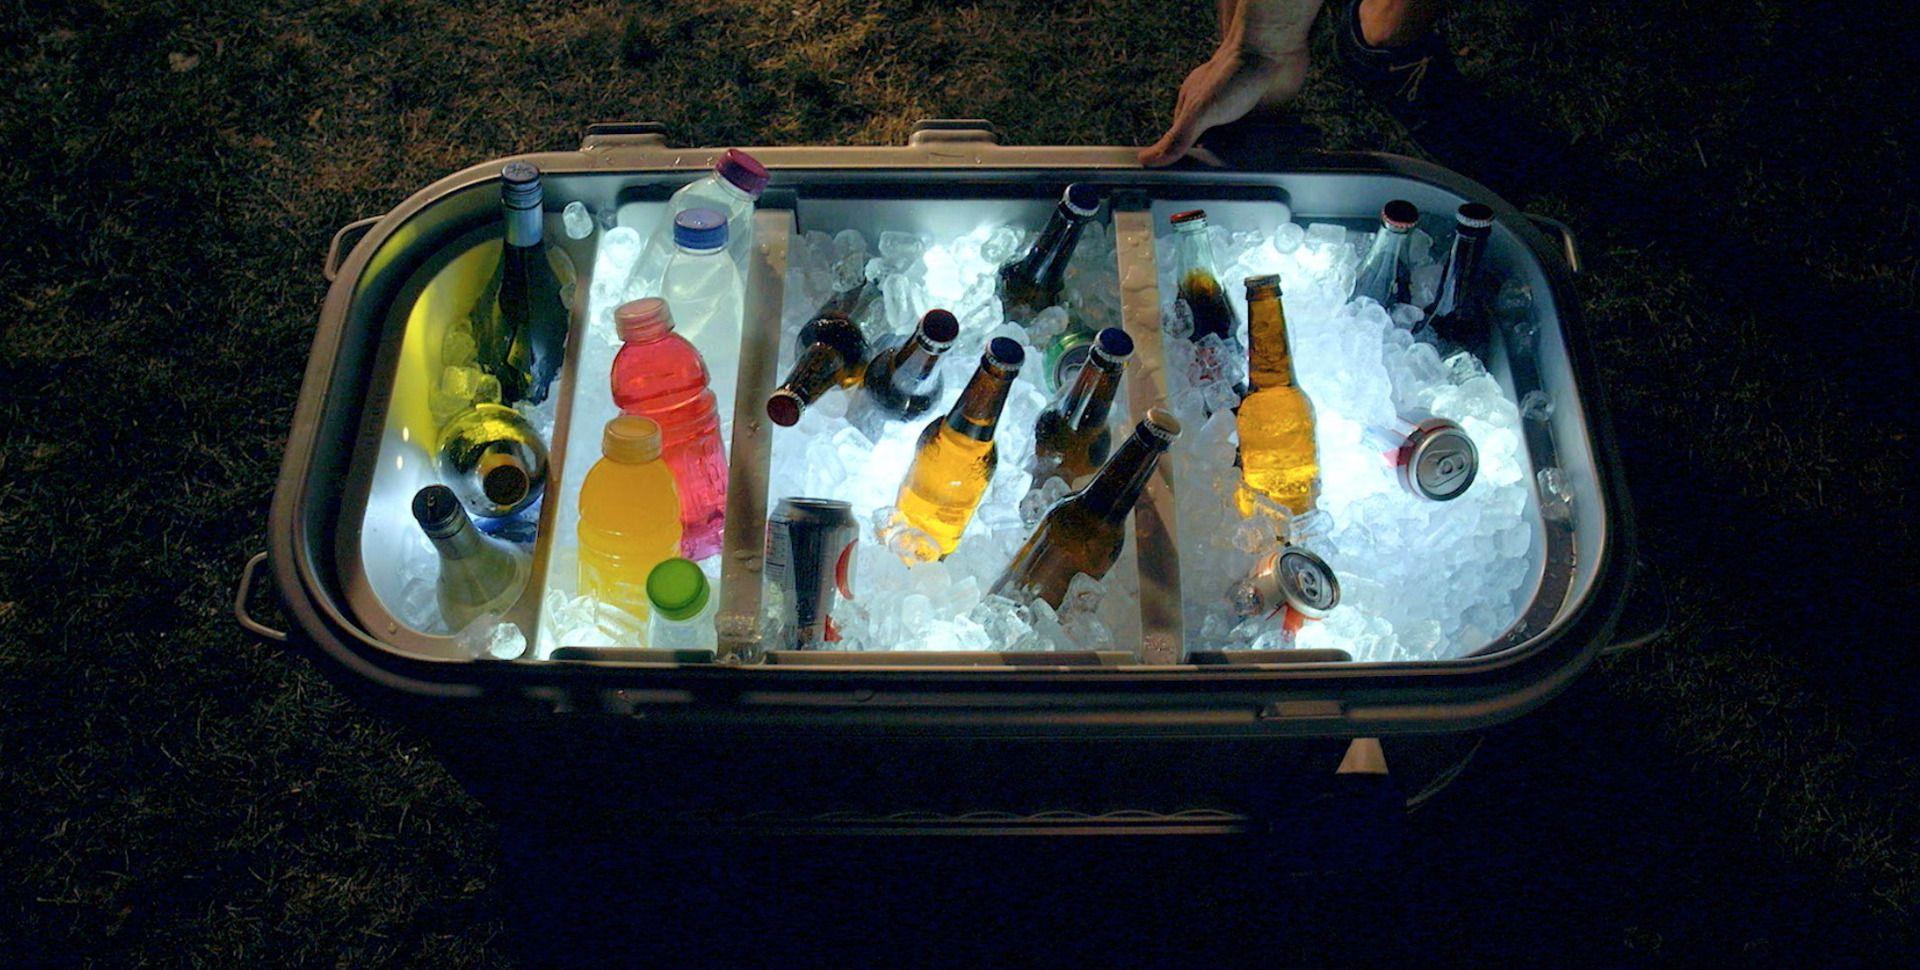 Igloo Party Bar - 125 Quart Cooler